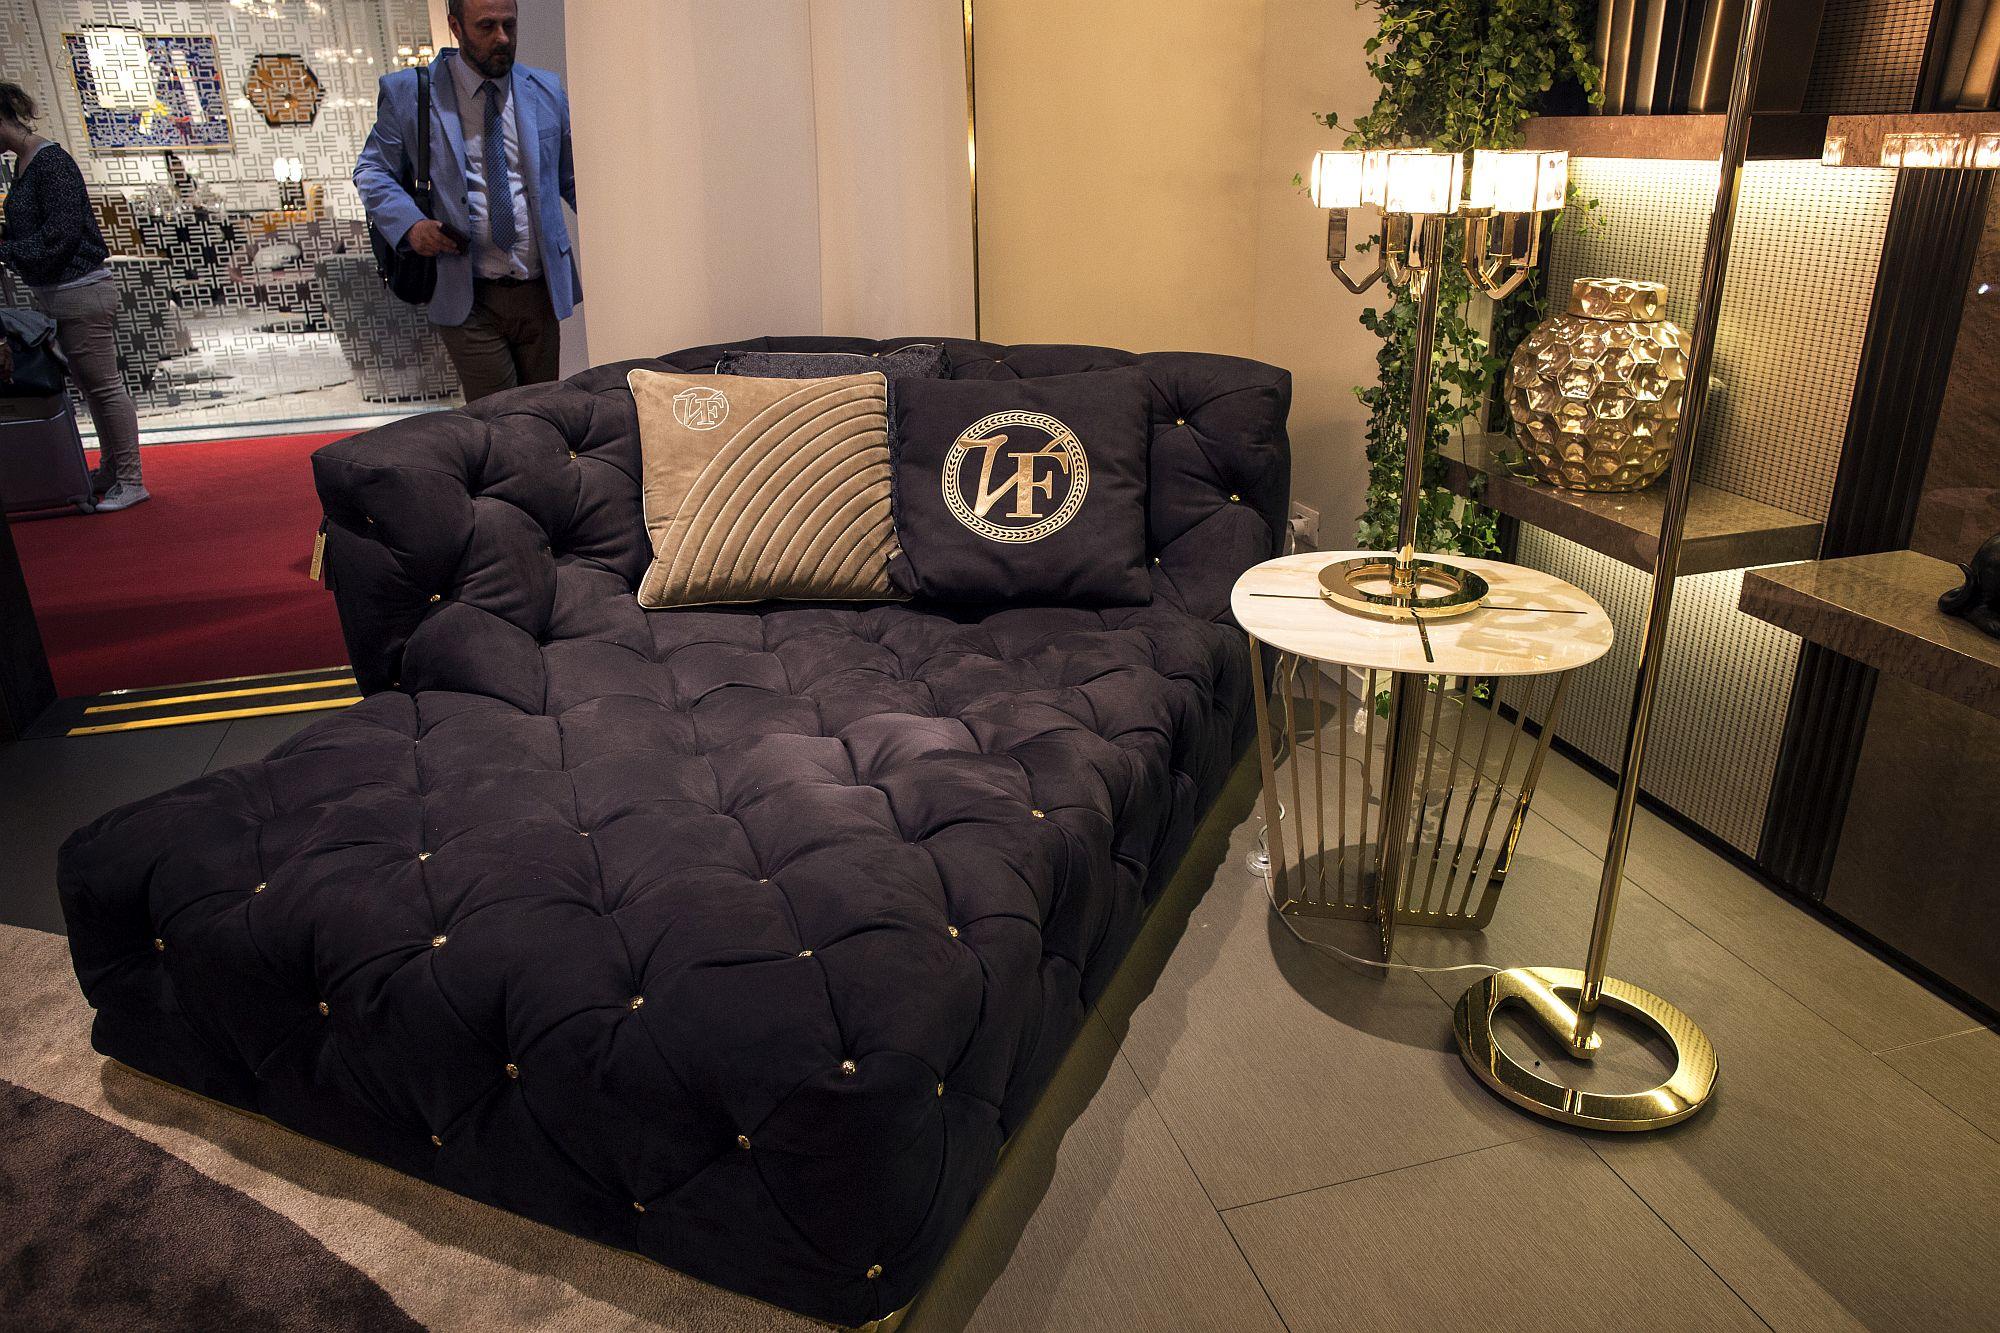 Contemporary-luxury-sofa-from-Vittoria-Frigerio-Trendy-Italian-decor